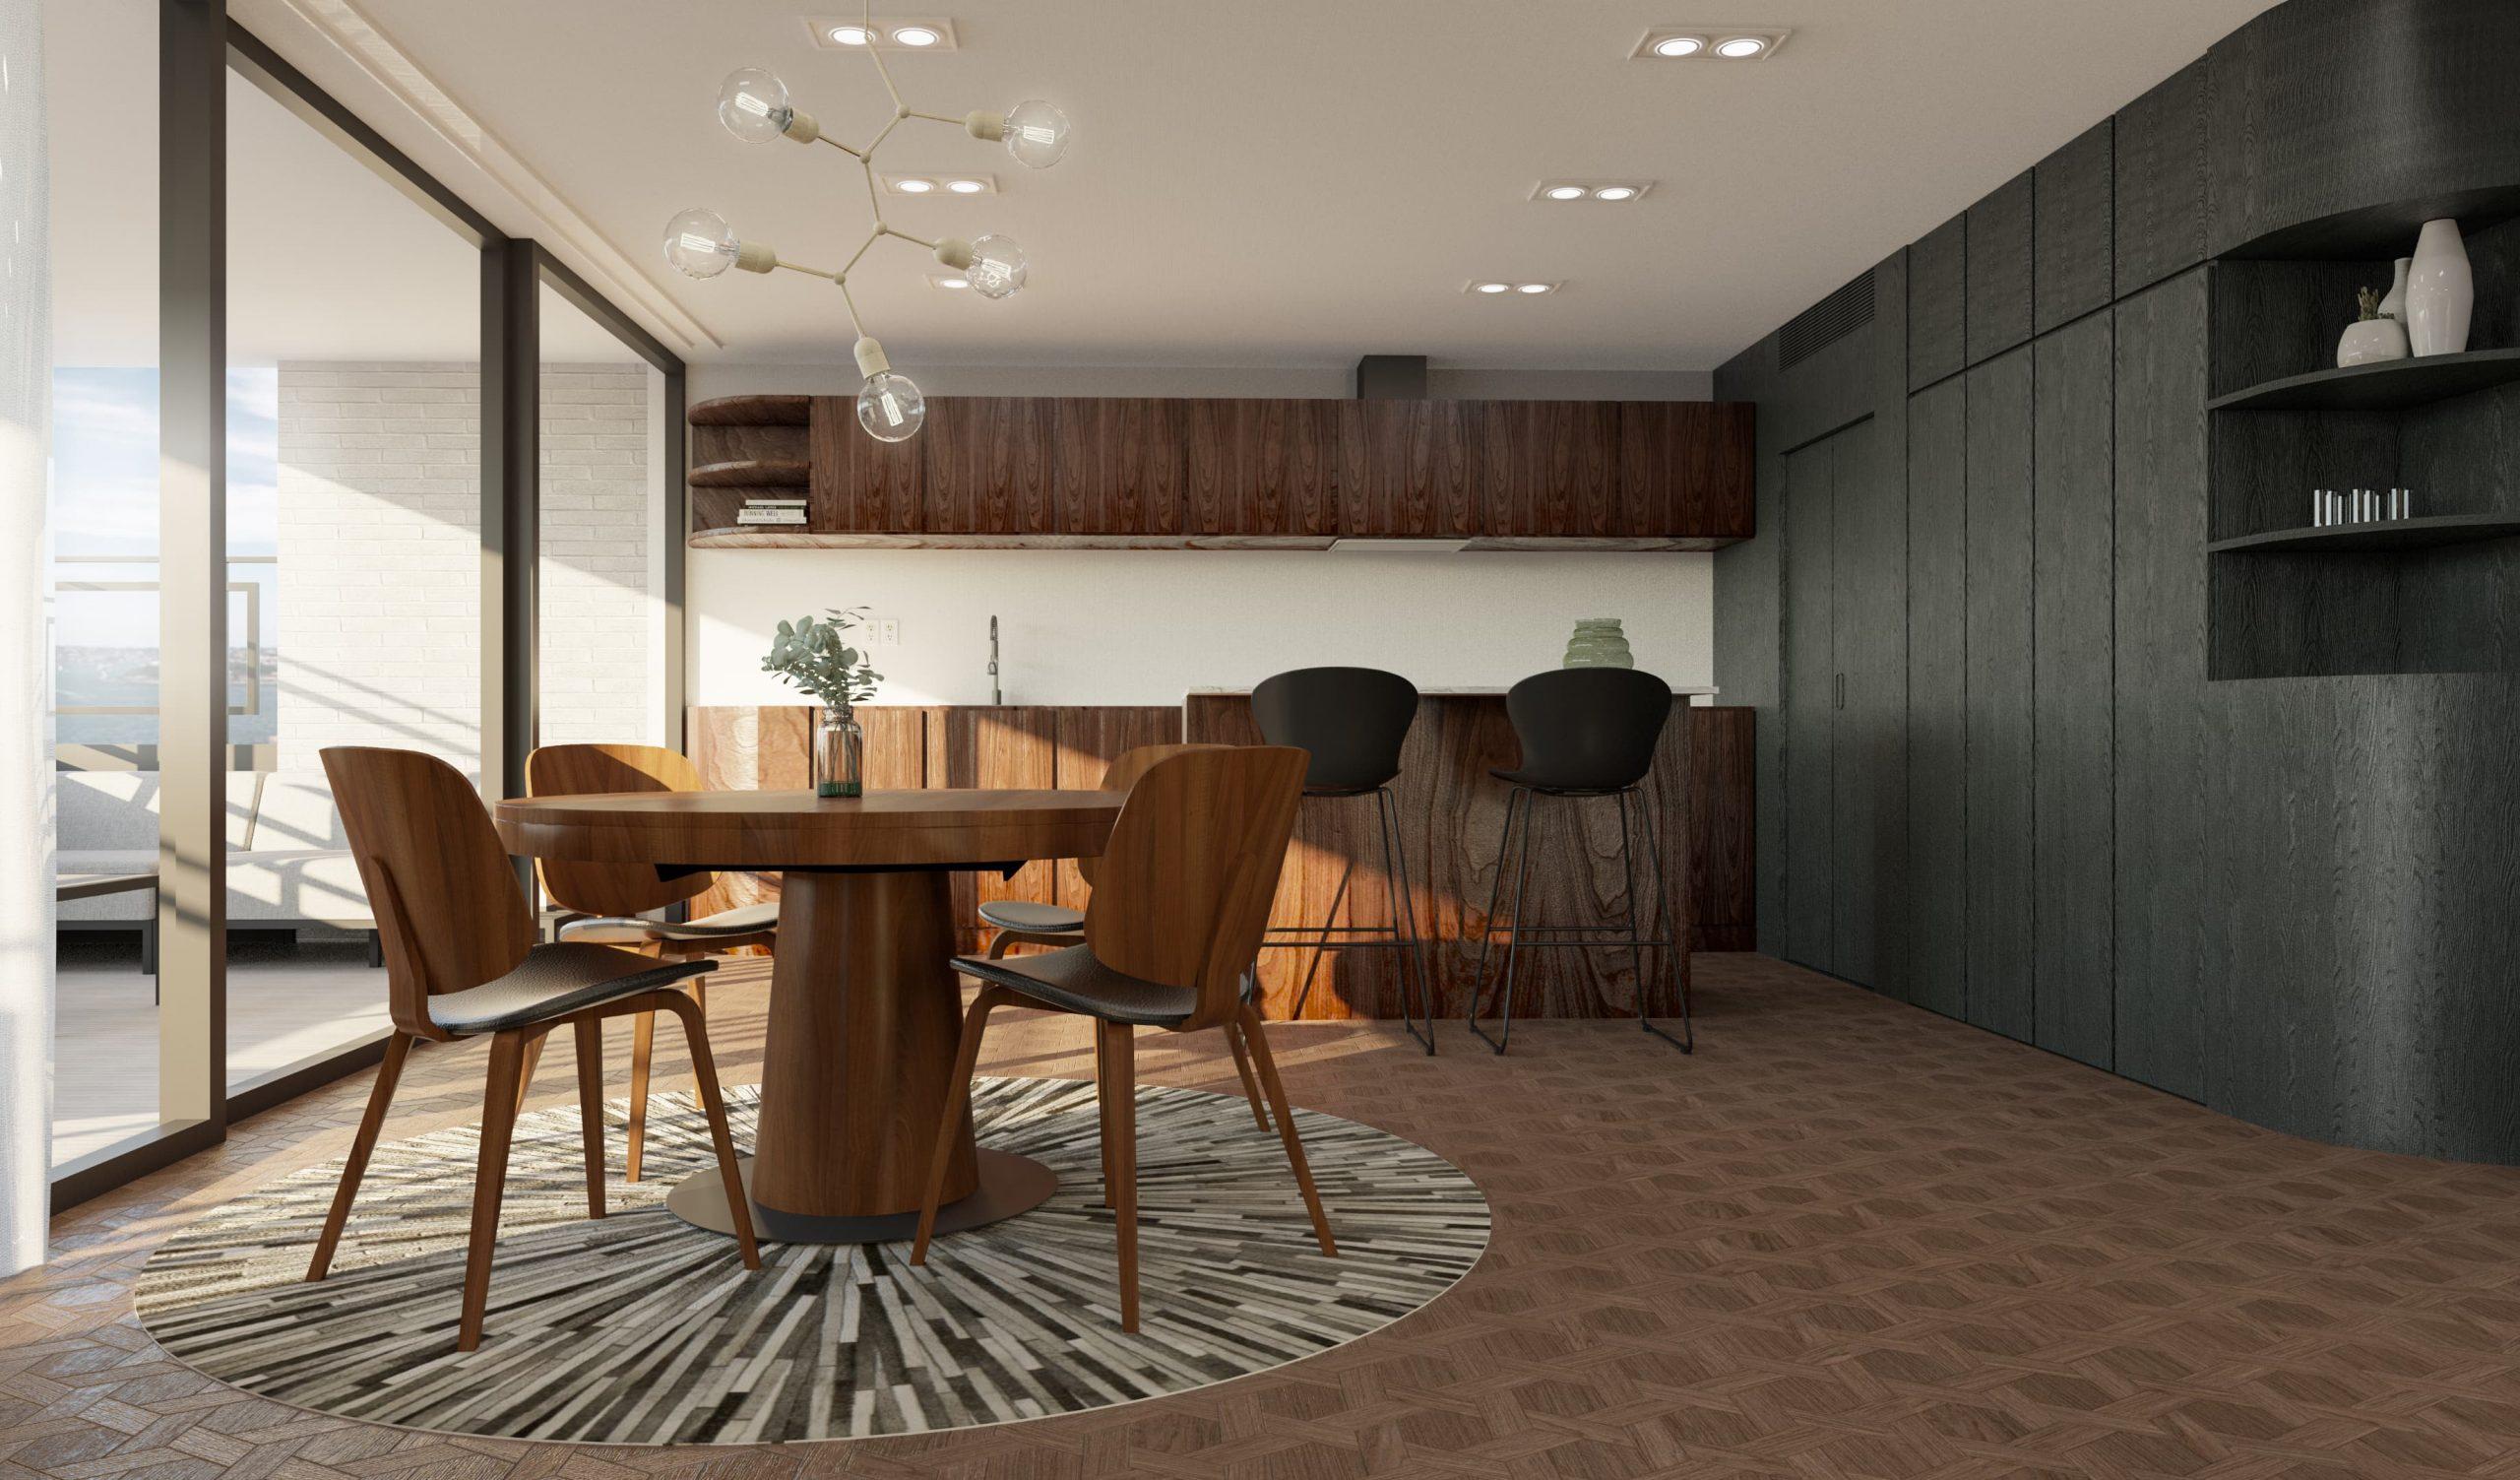 8/12 Dining Room, Loft, Design Package